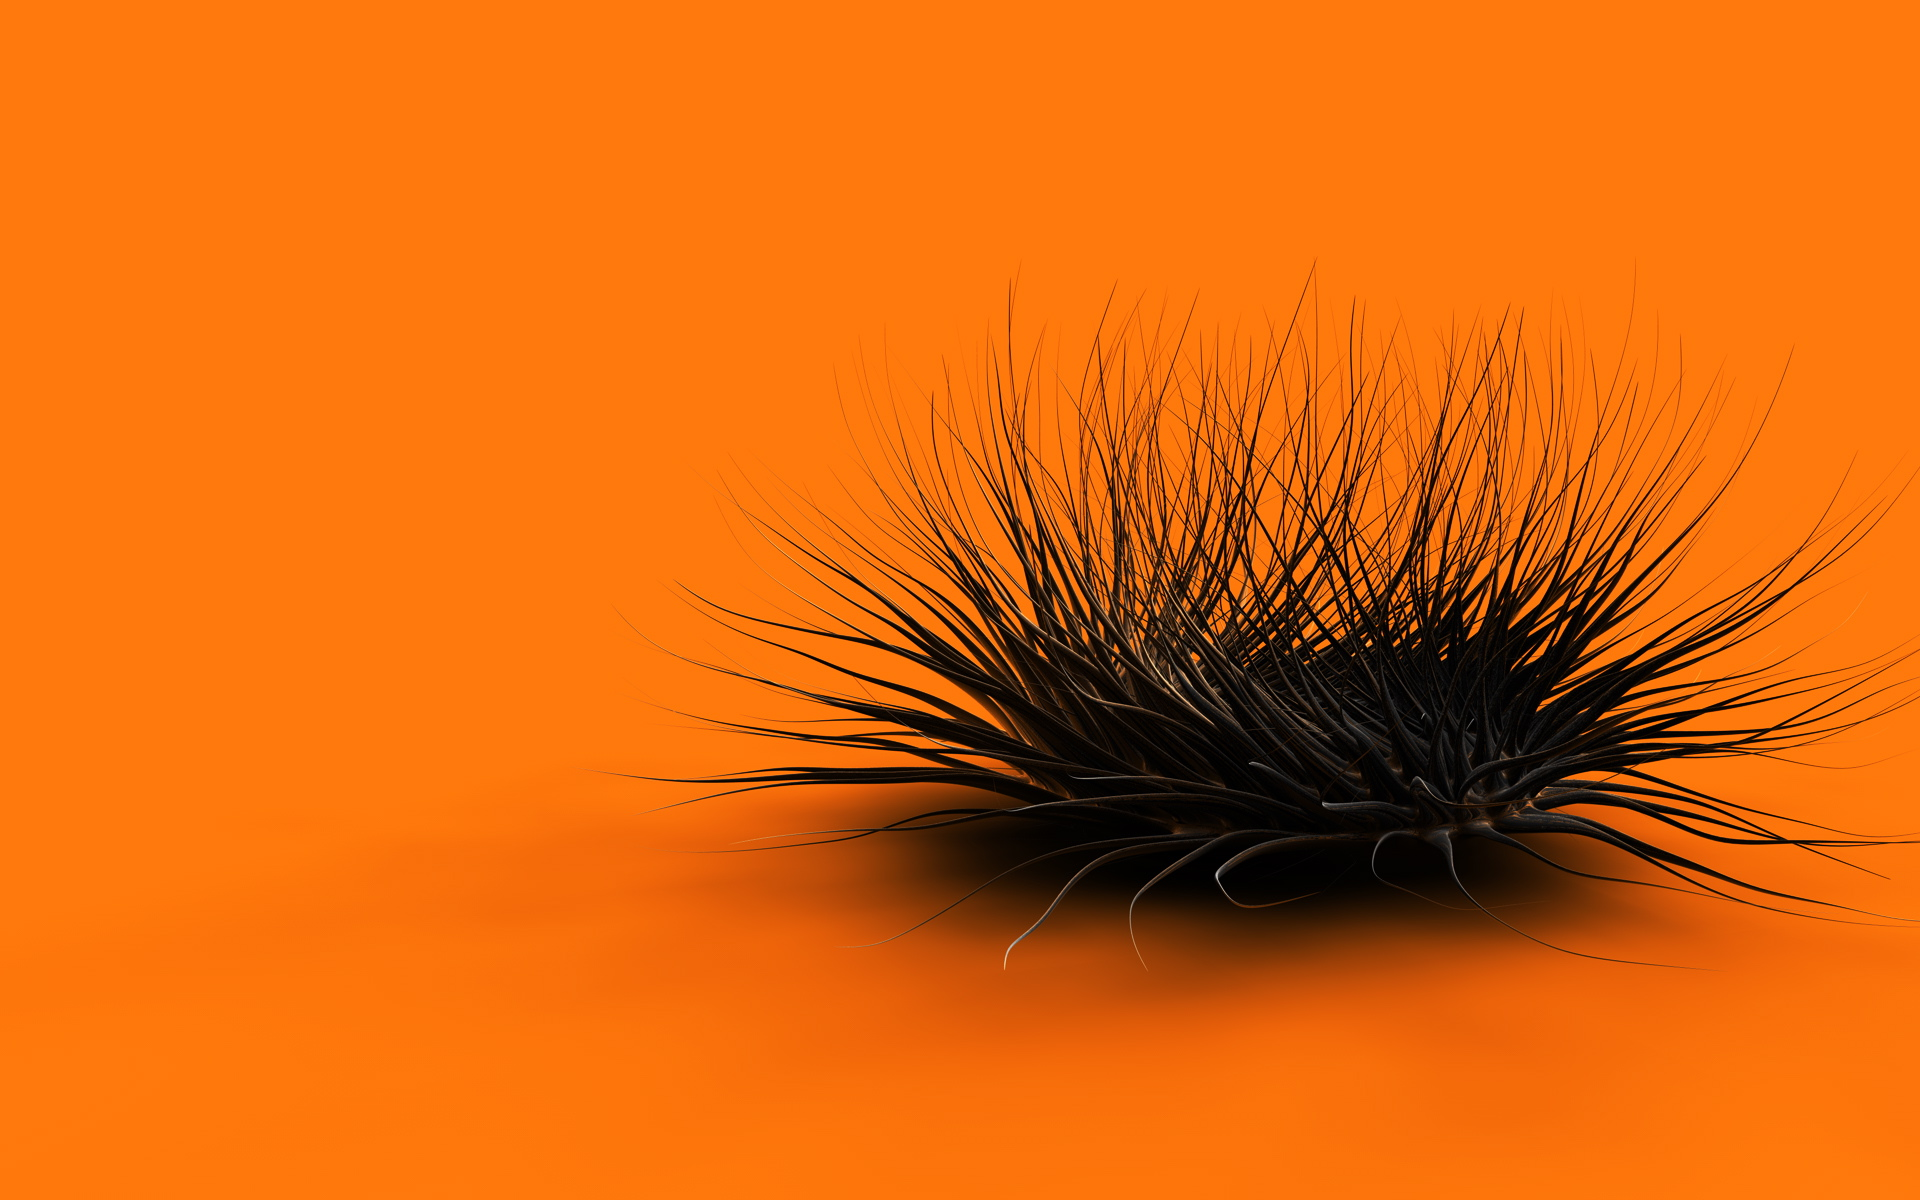 volim narančasto 3D-graphics_Orange_chaos_006986_